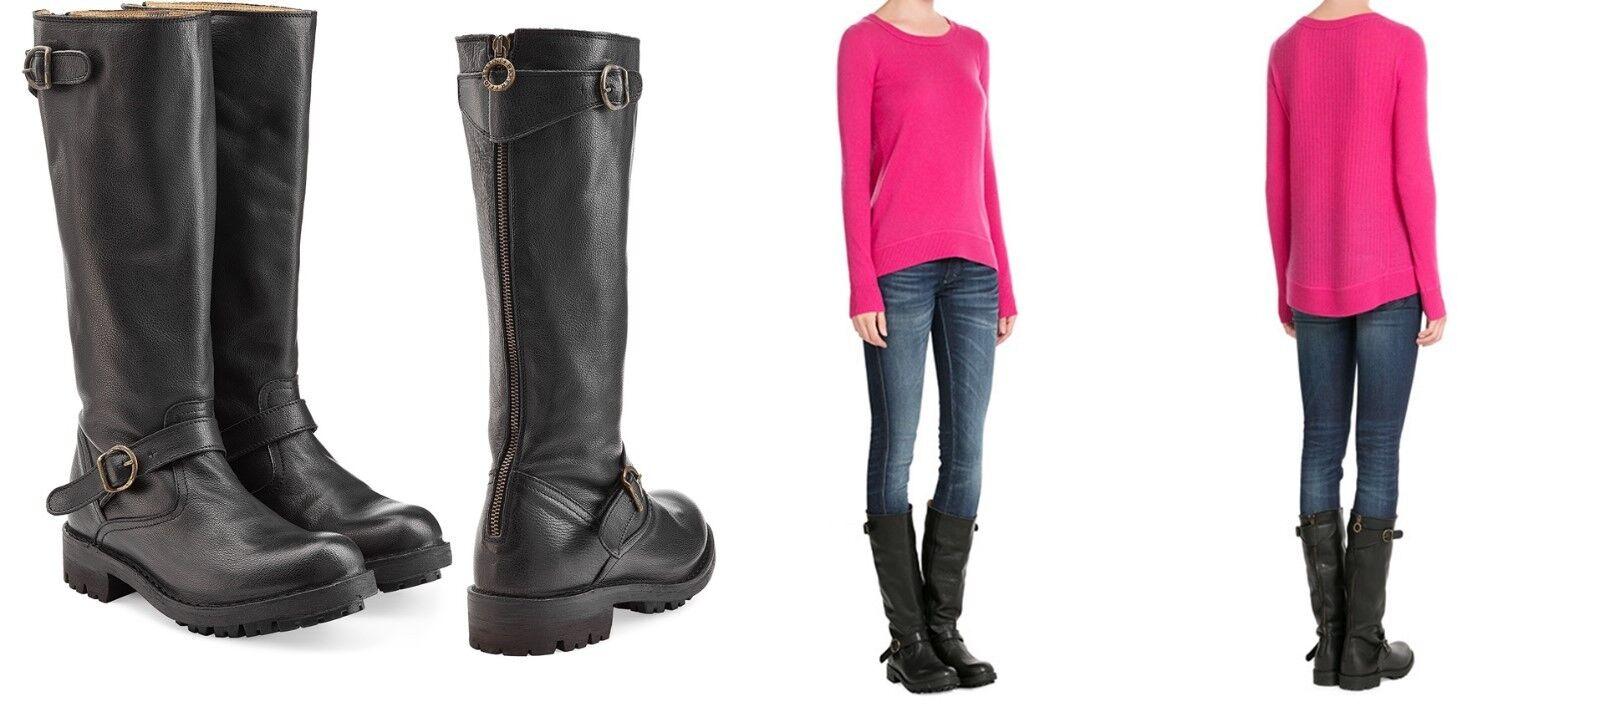 Fiorentini + Baker Women's Women's Women's Boots Jules Jade D Leather Knee Boots 019b78